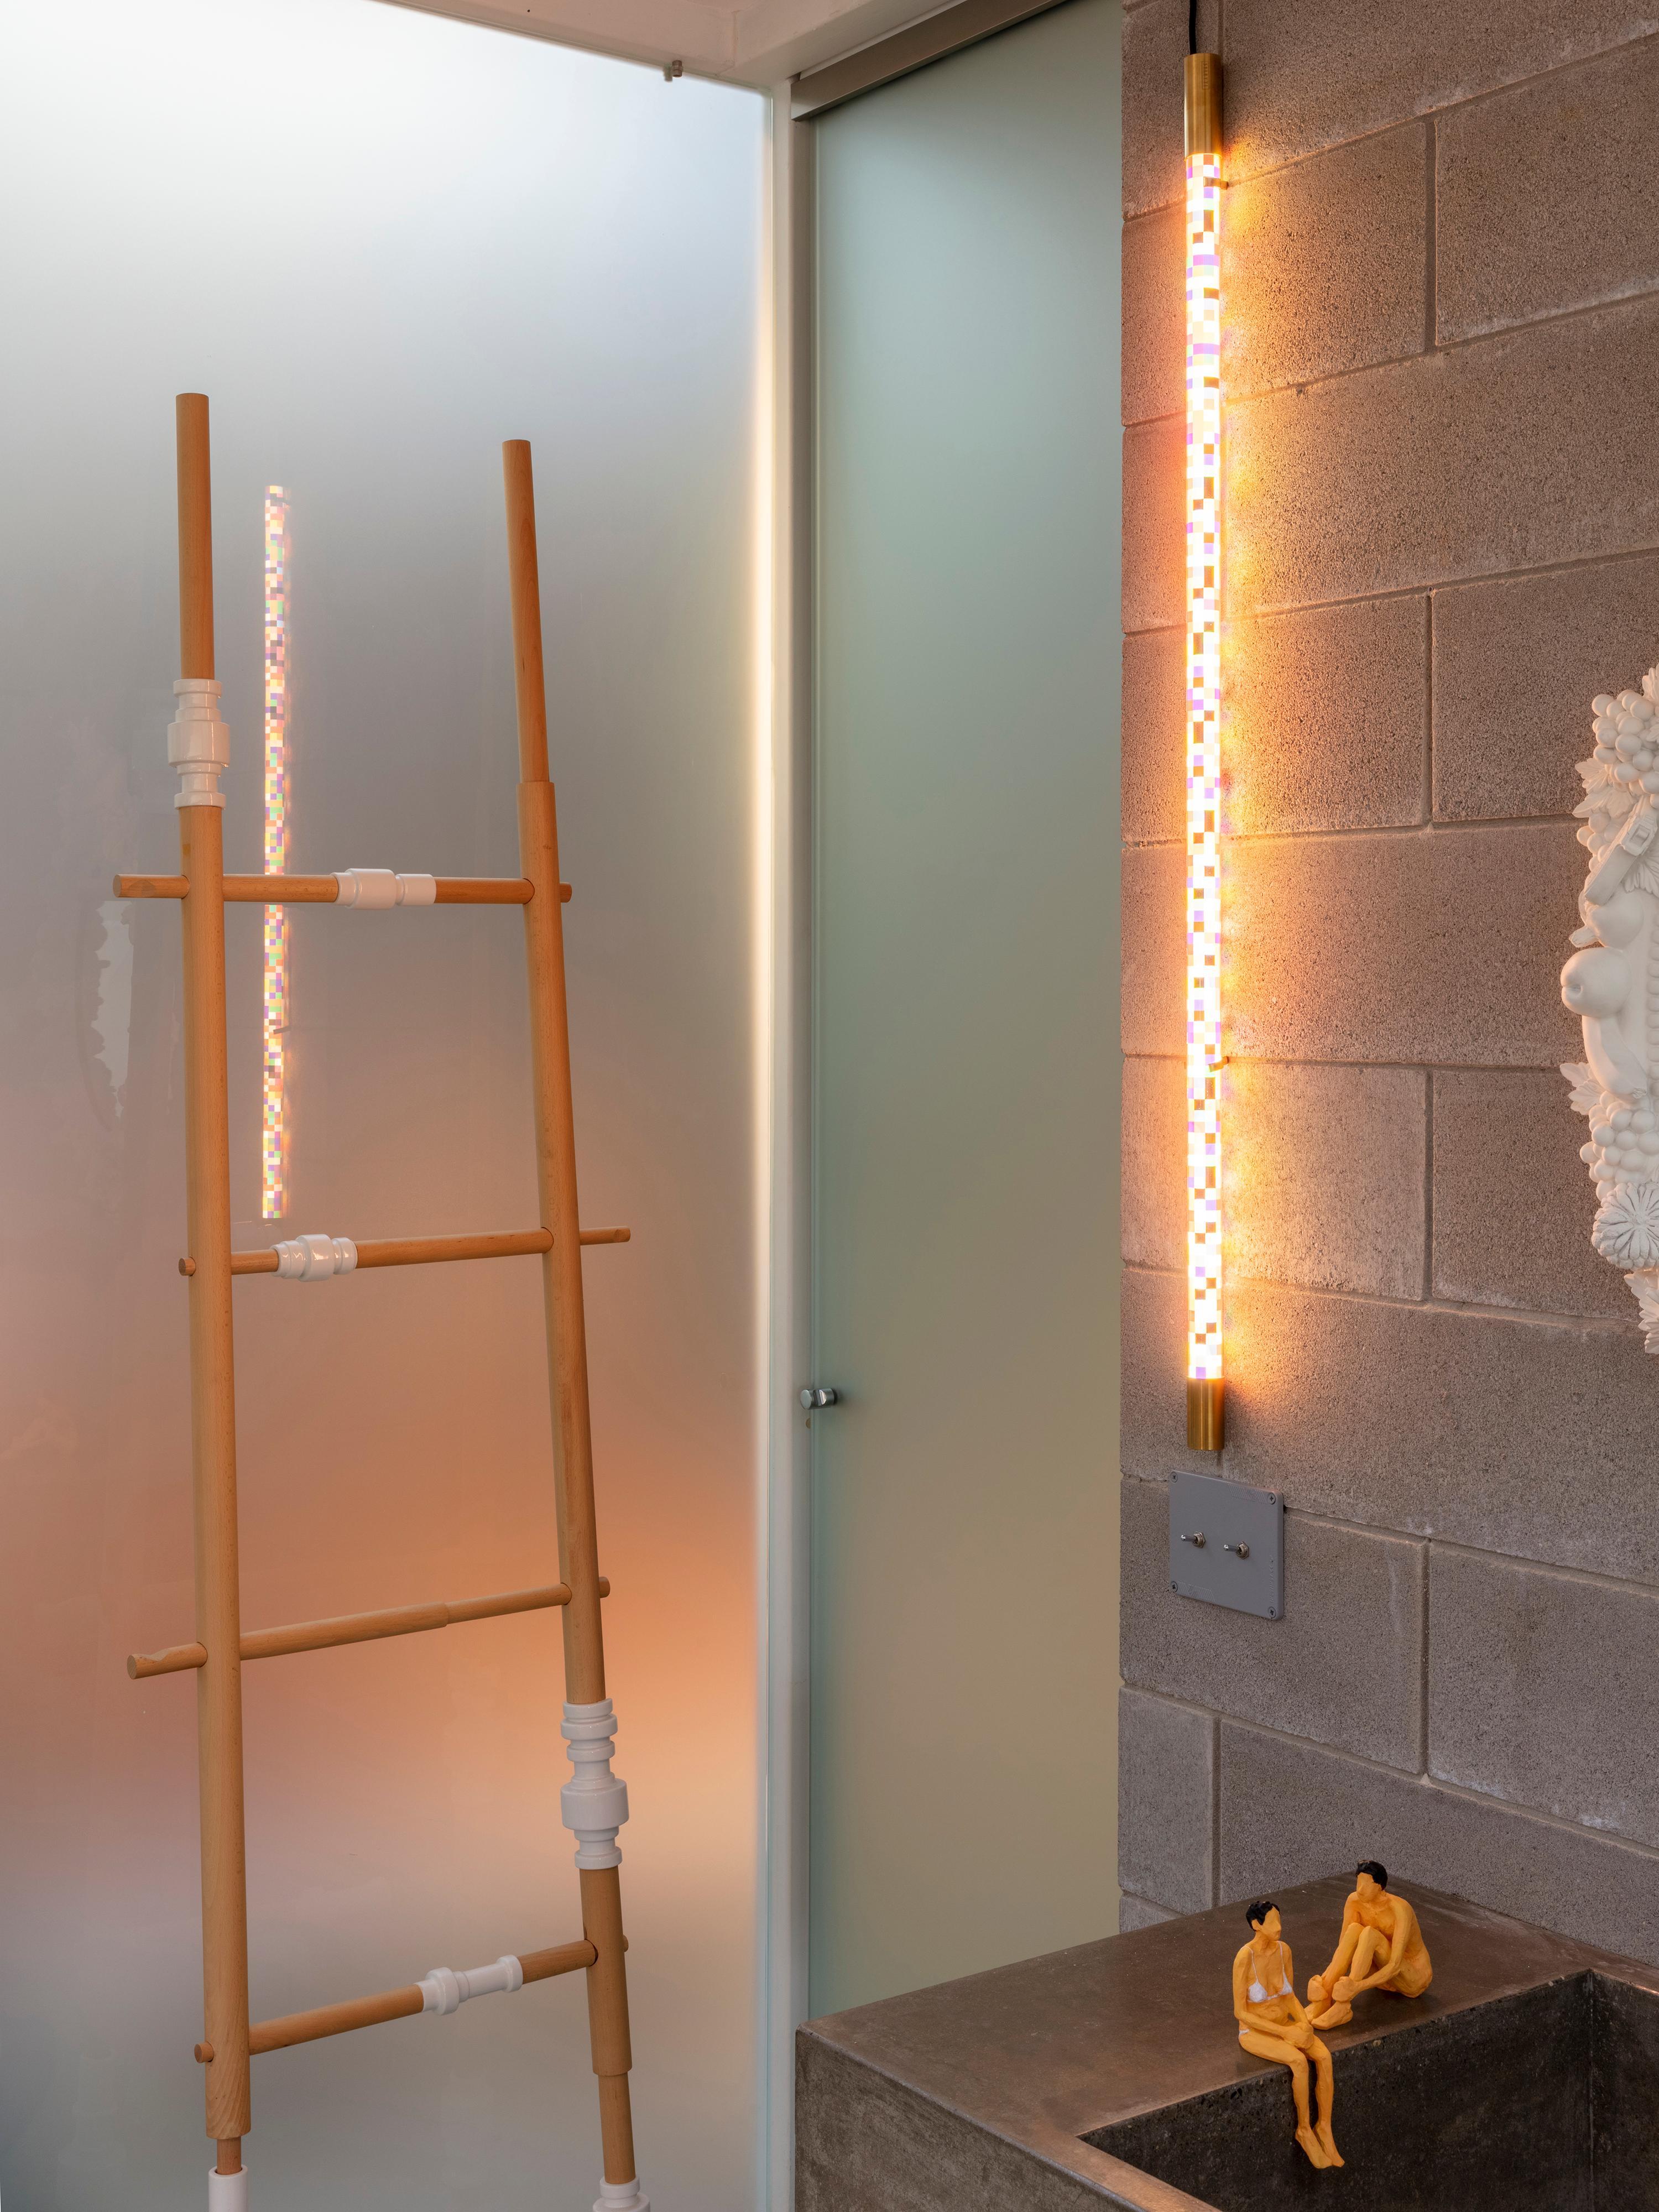 LED-wandlamp Linea Pixled met stekker, Lampenkap: kunststof, Multicolour, L 124 cm